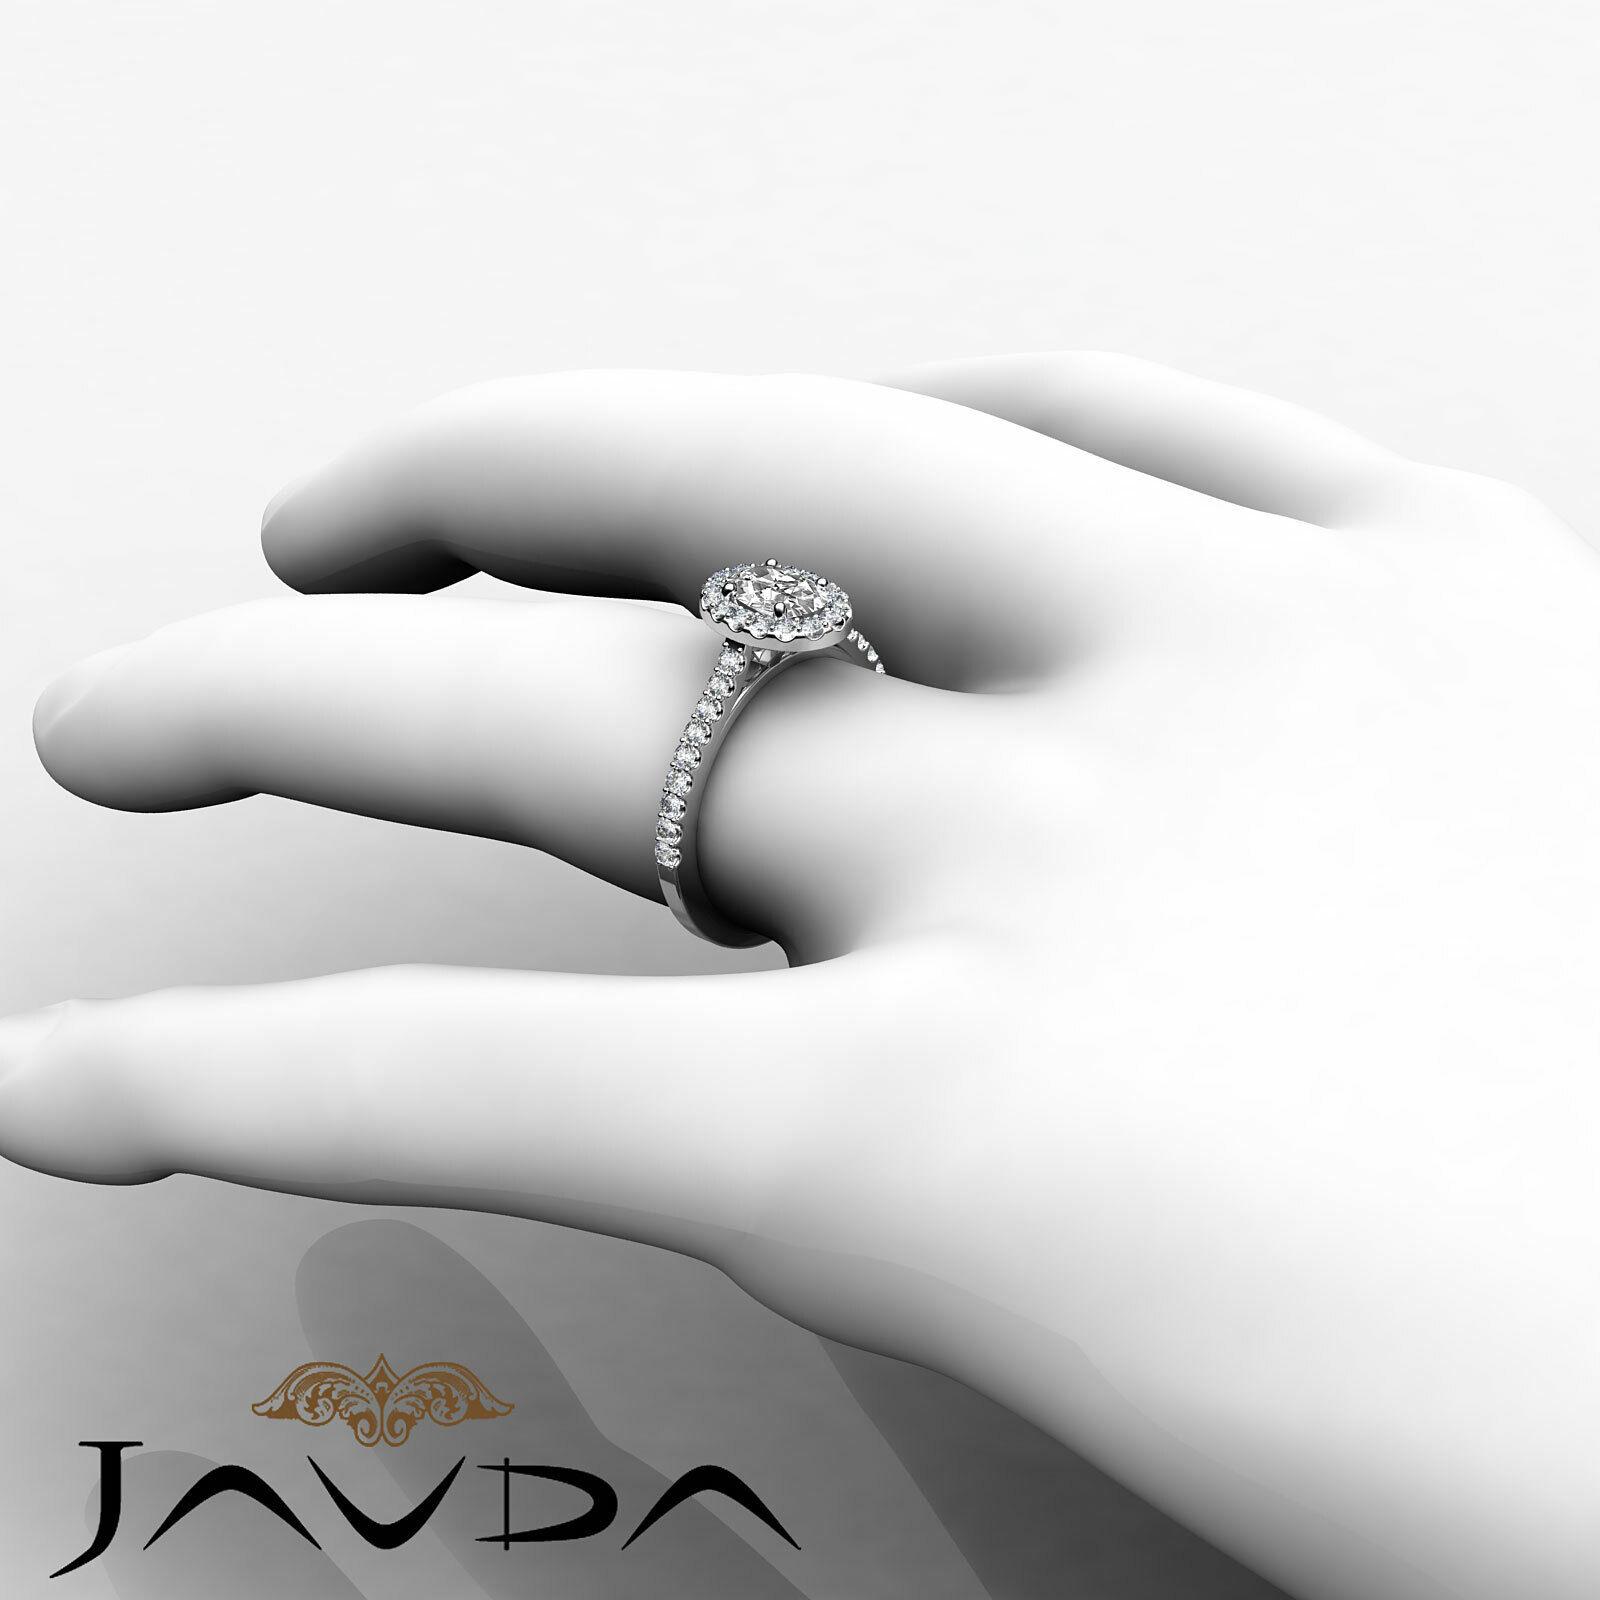 1.6ctw Prong Setting Oval Diamond Engagement Ring GIA H-VS1 White Gold Women New 5